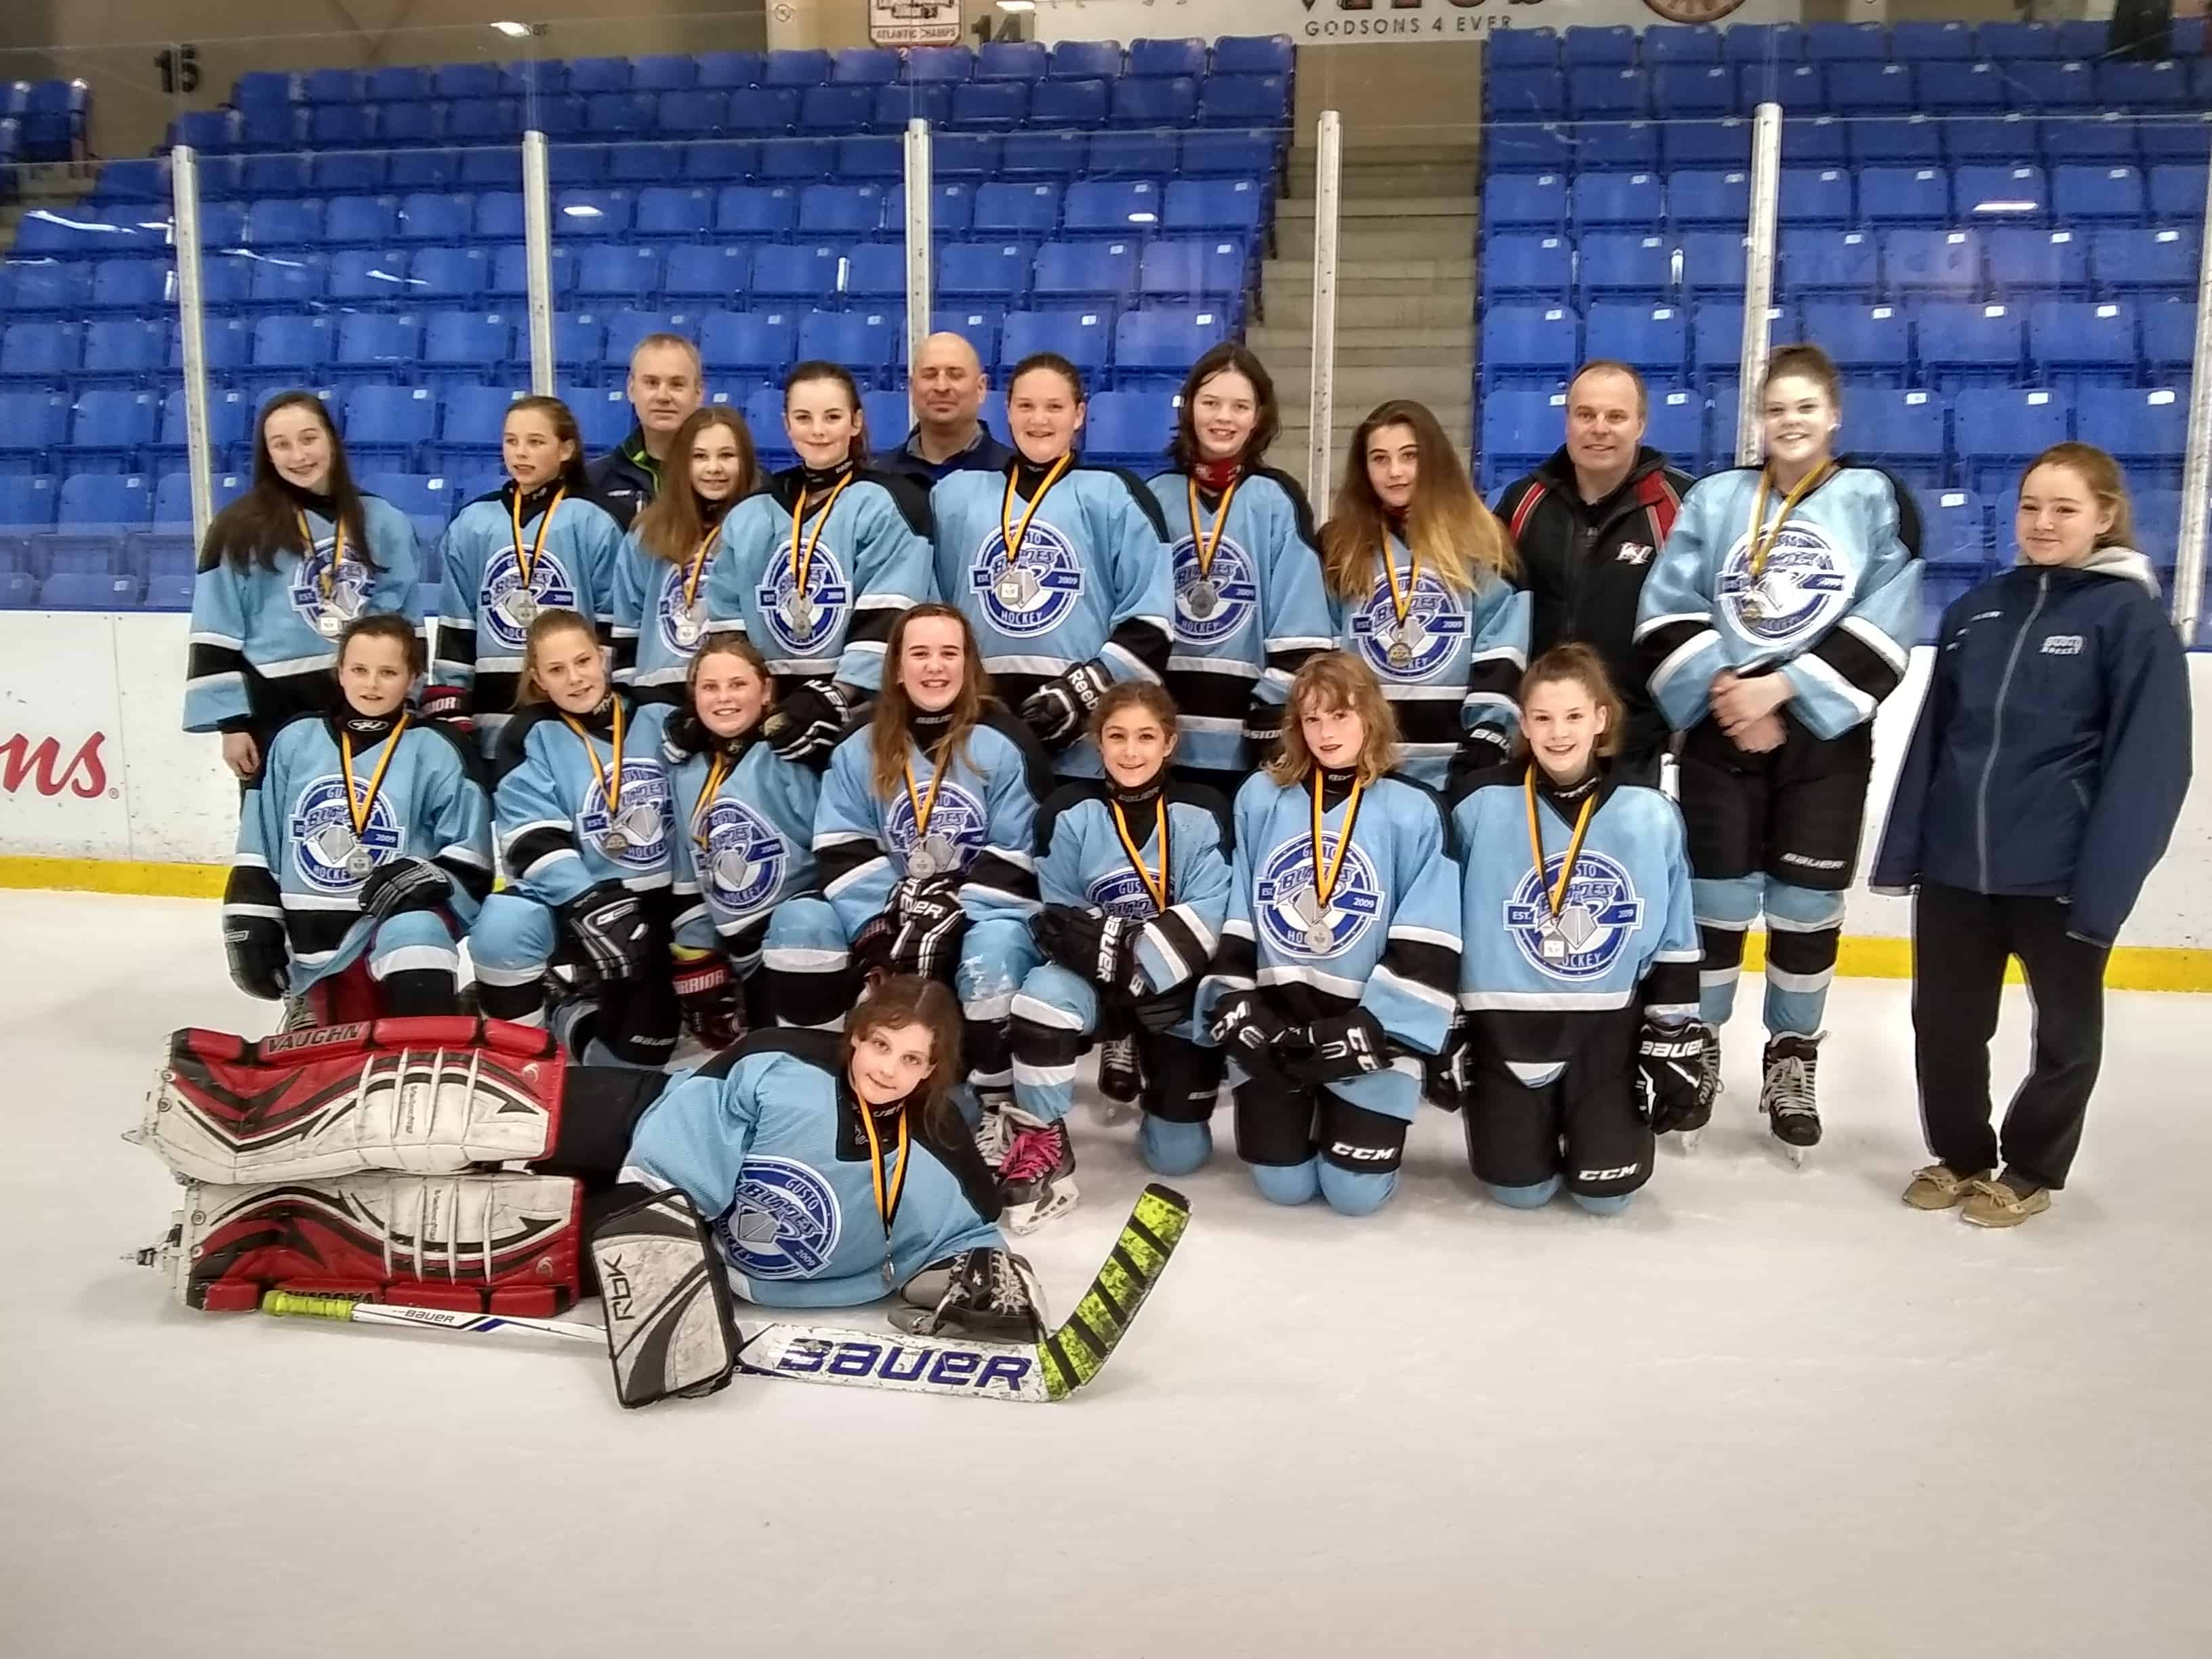 Gusto Blades Atlantic Hockey Group